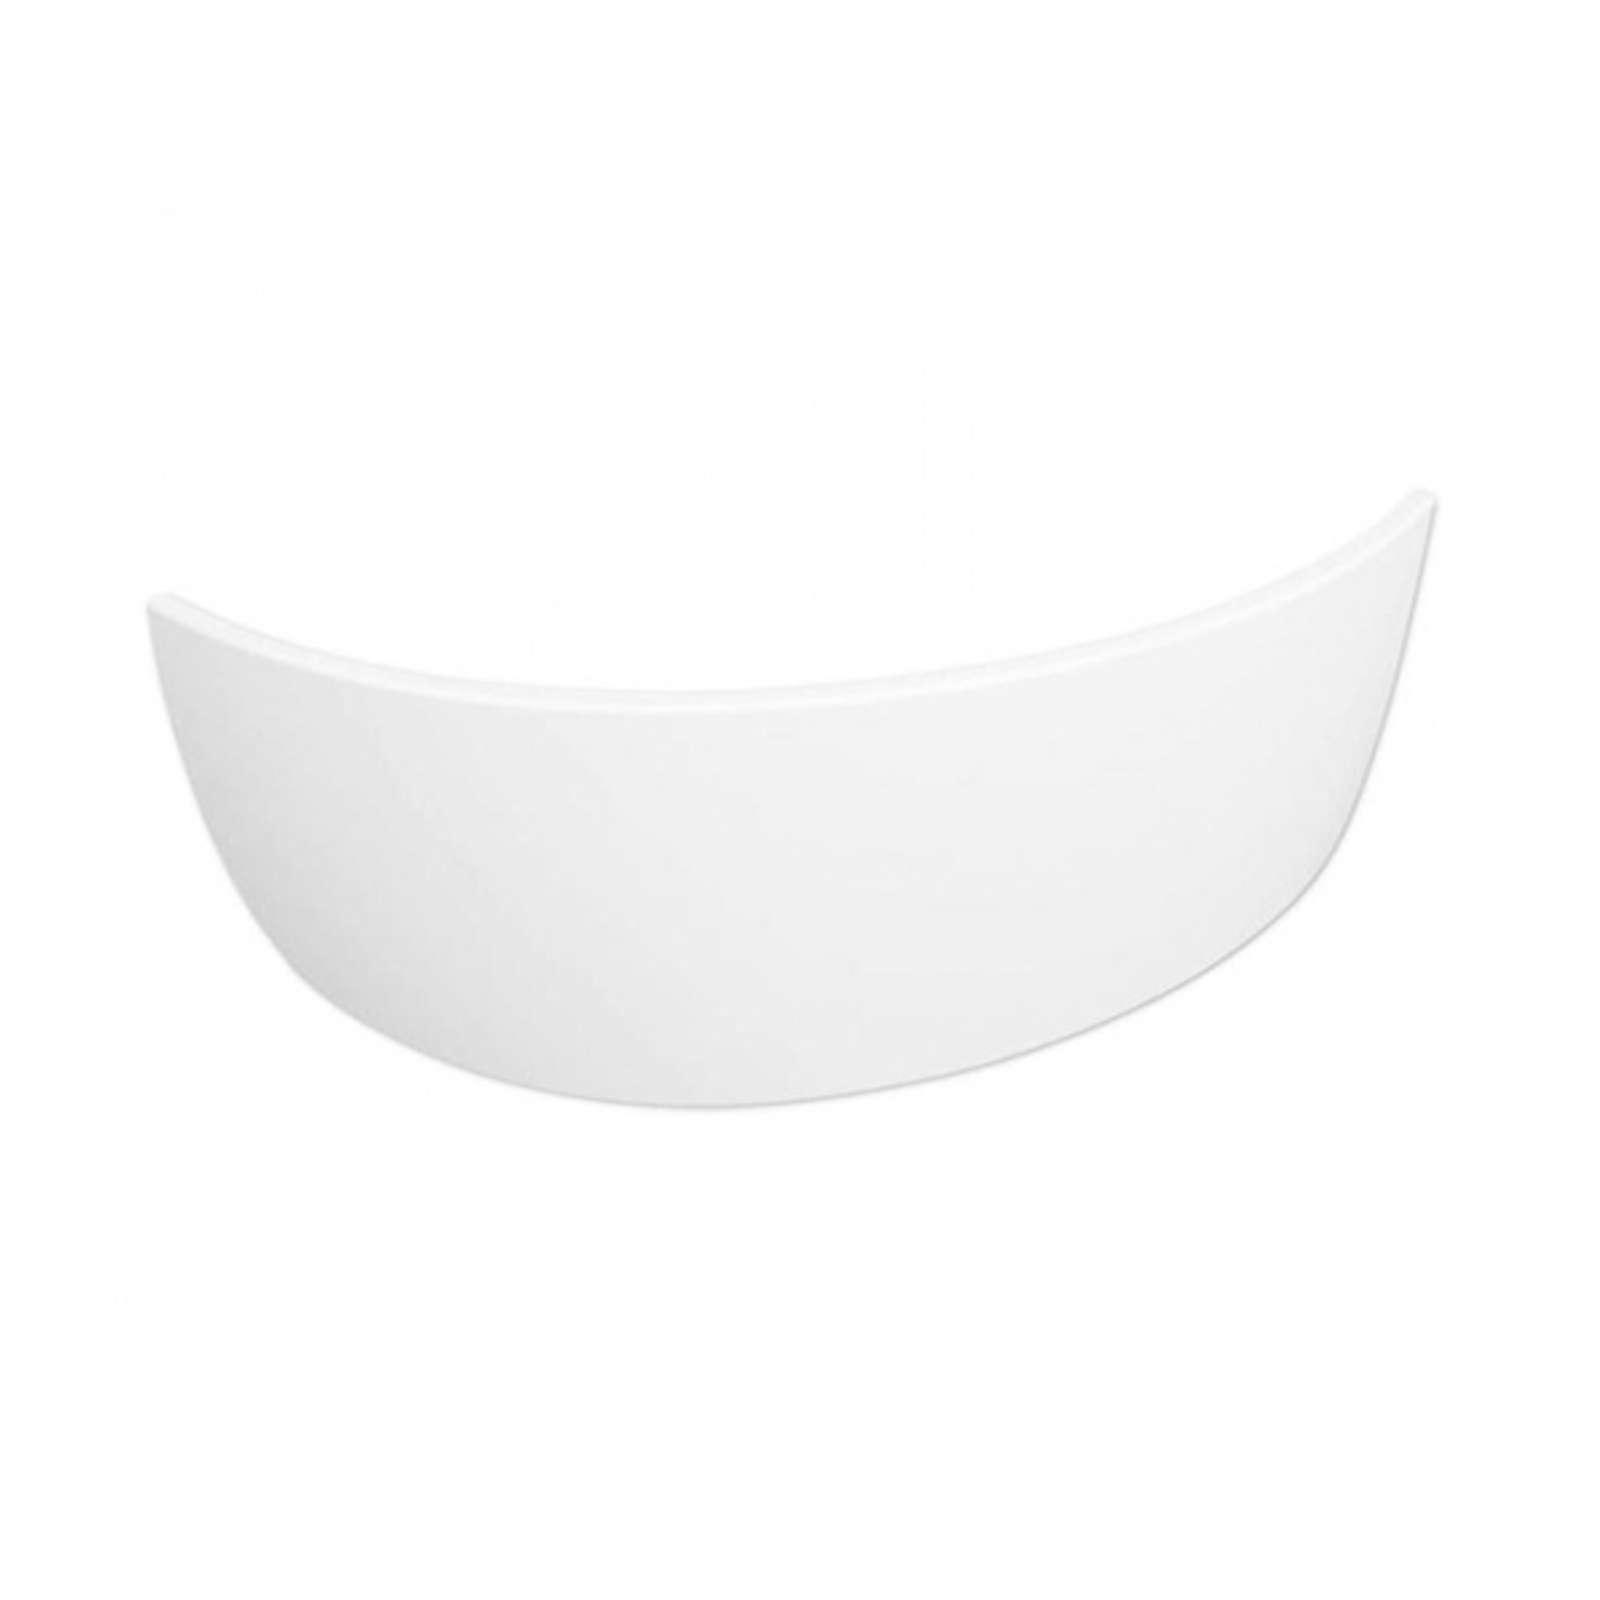 Панель фронтальная для акриловой ванны Santek Канны 150х150 см